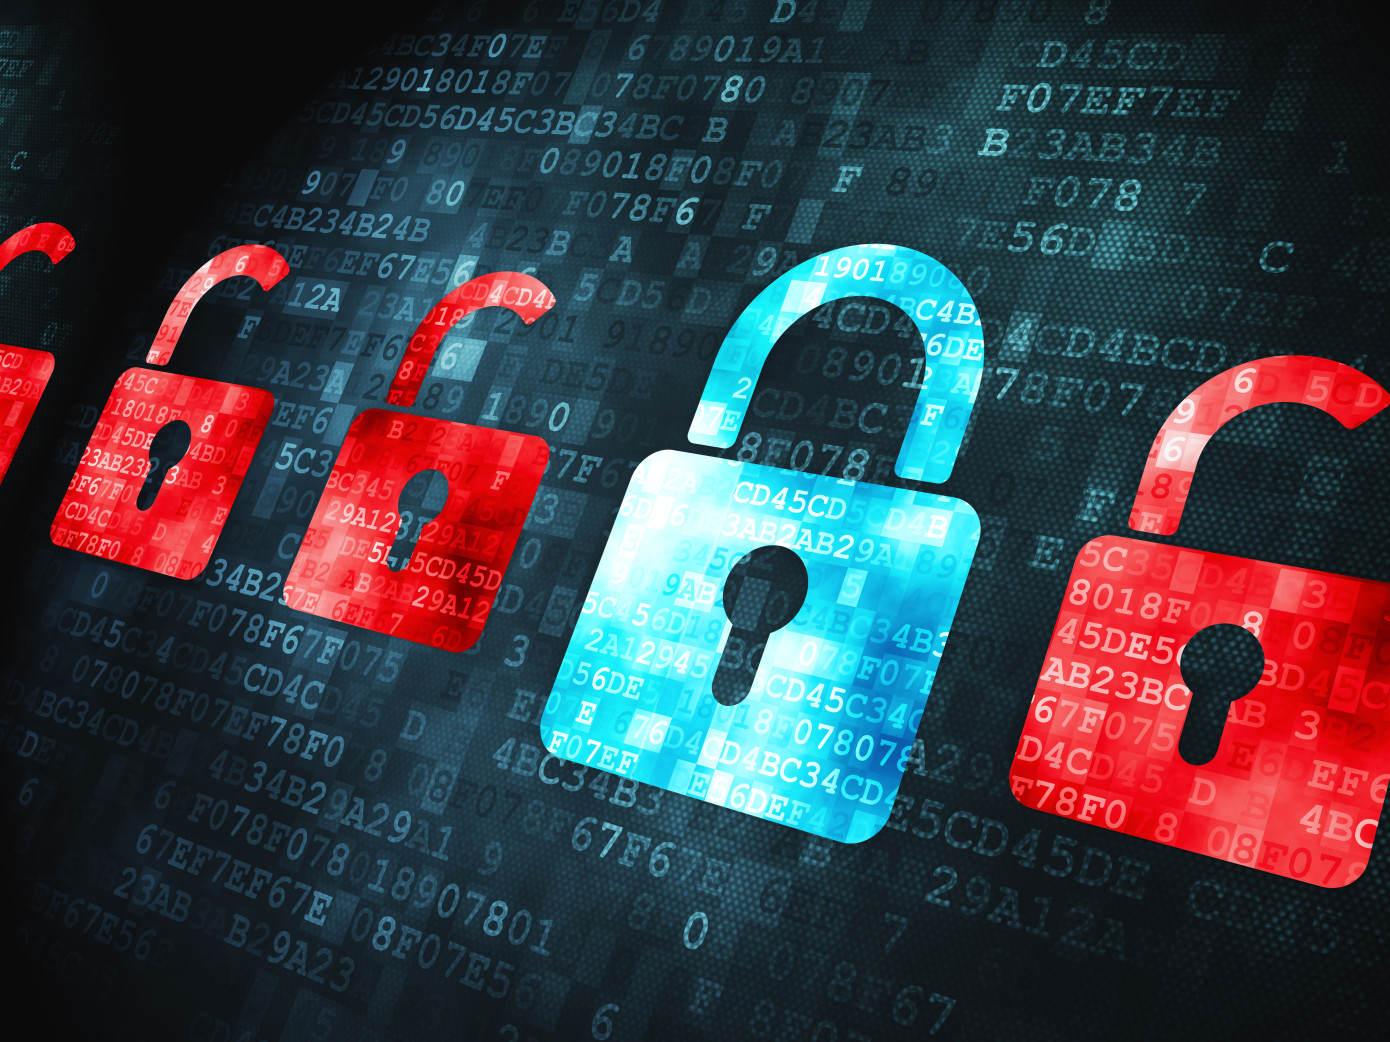 Coinbase ابزار ارتقای امنیتی خود را متن باز (open source) می کند